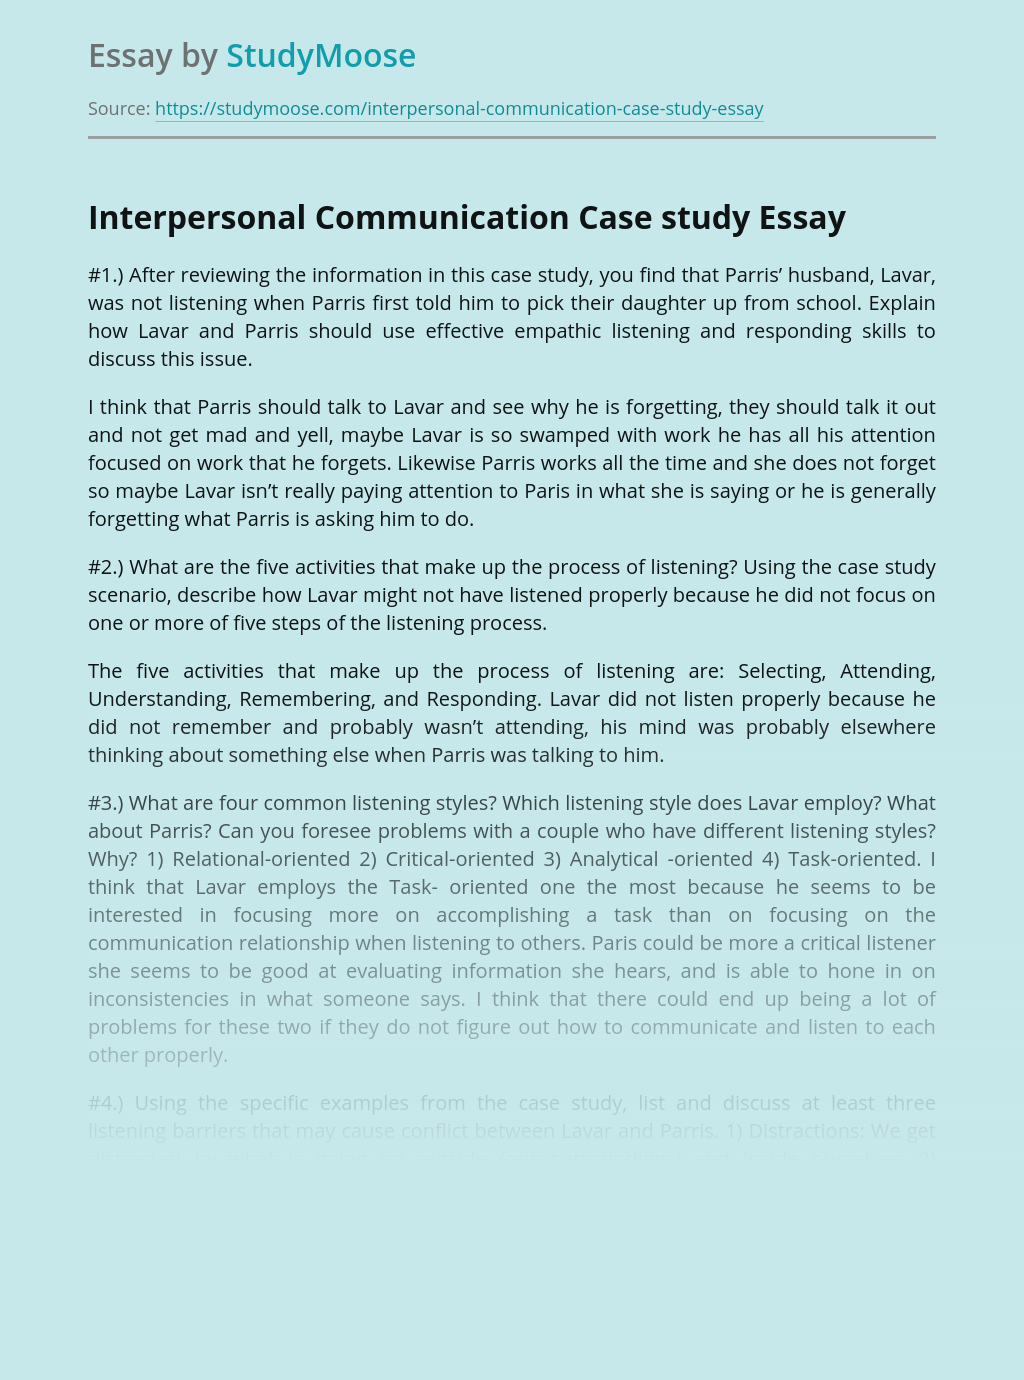 Interpersonal Communication Case study